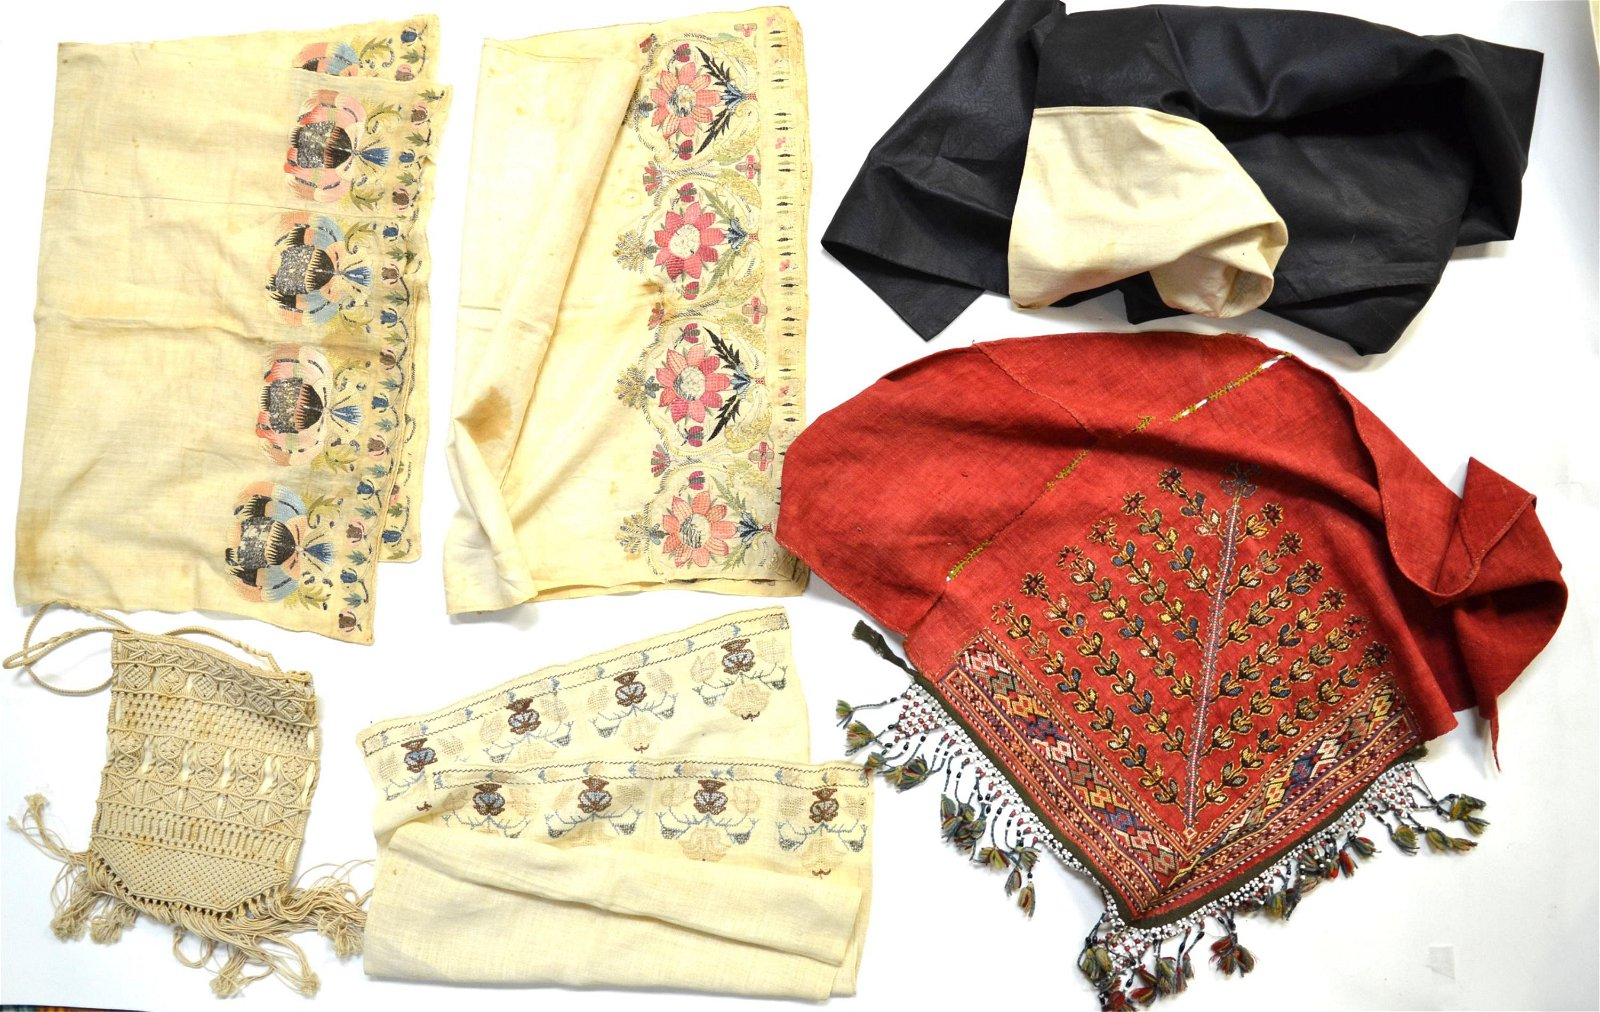 Six Pcs of Textiles